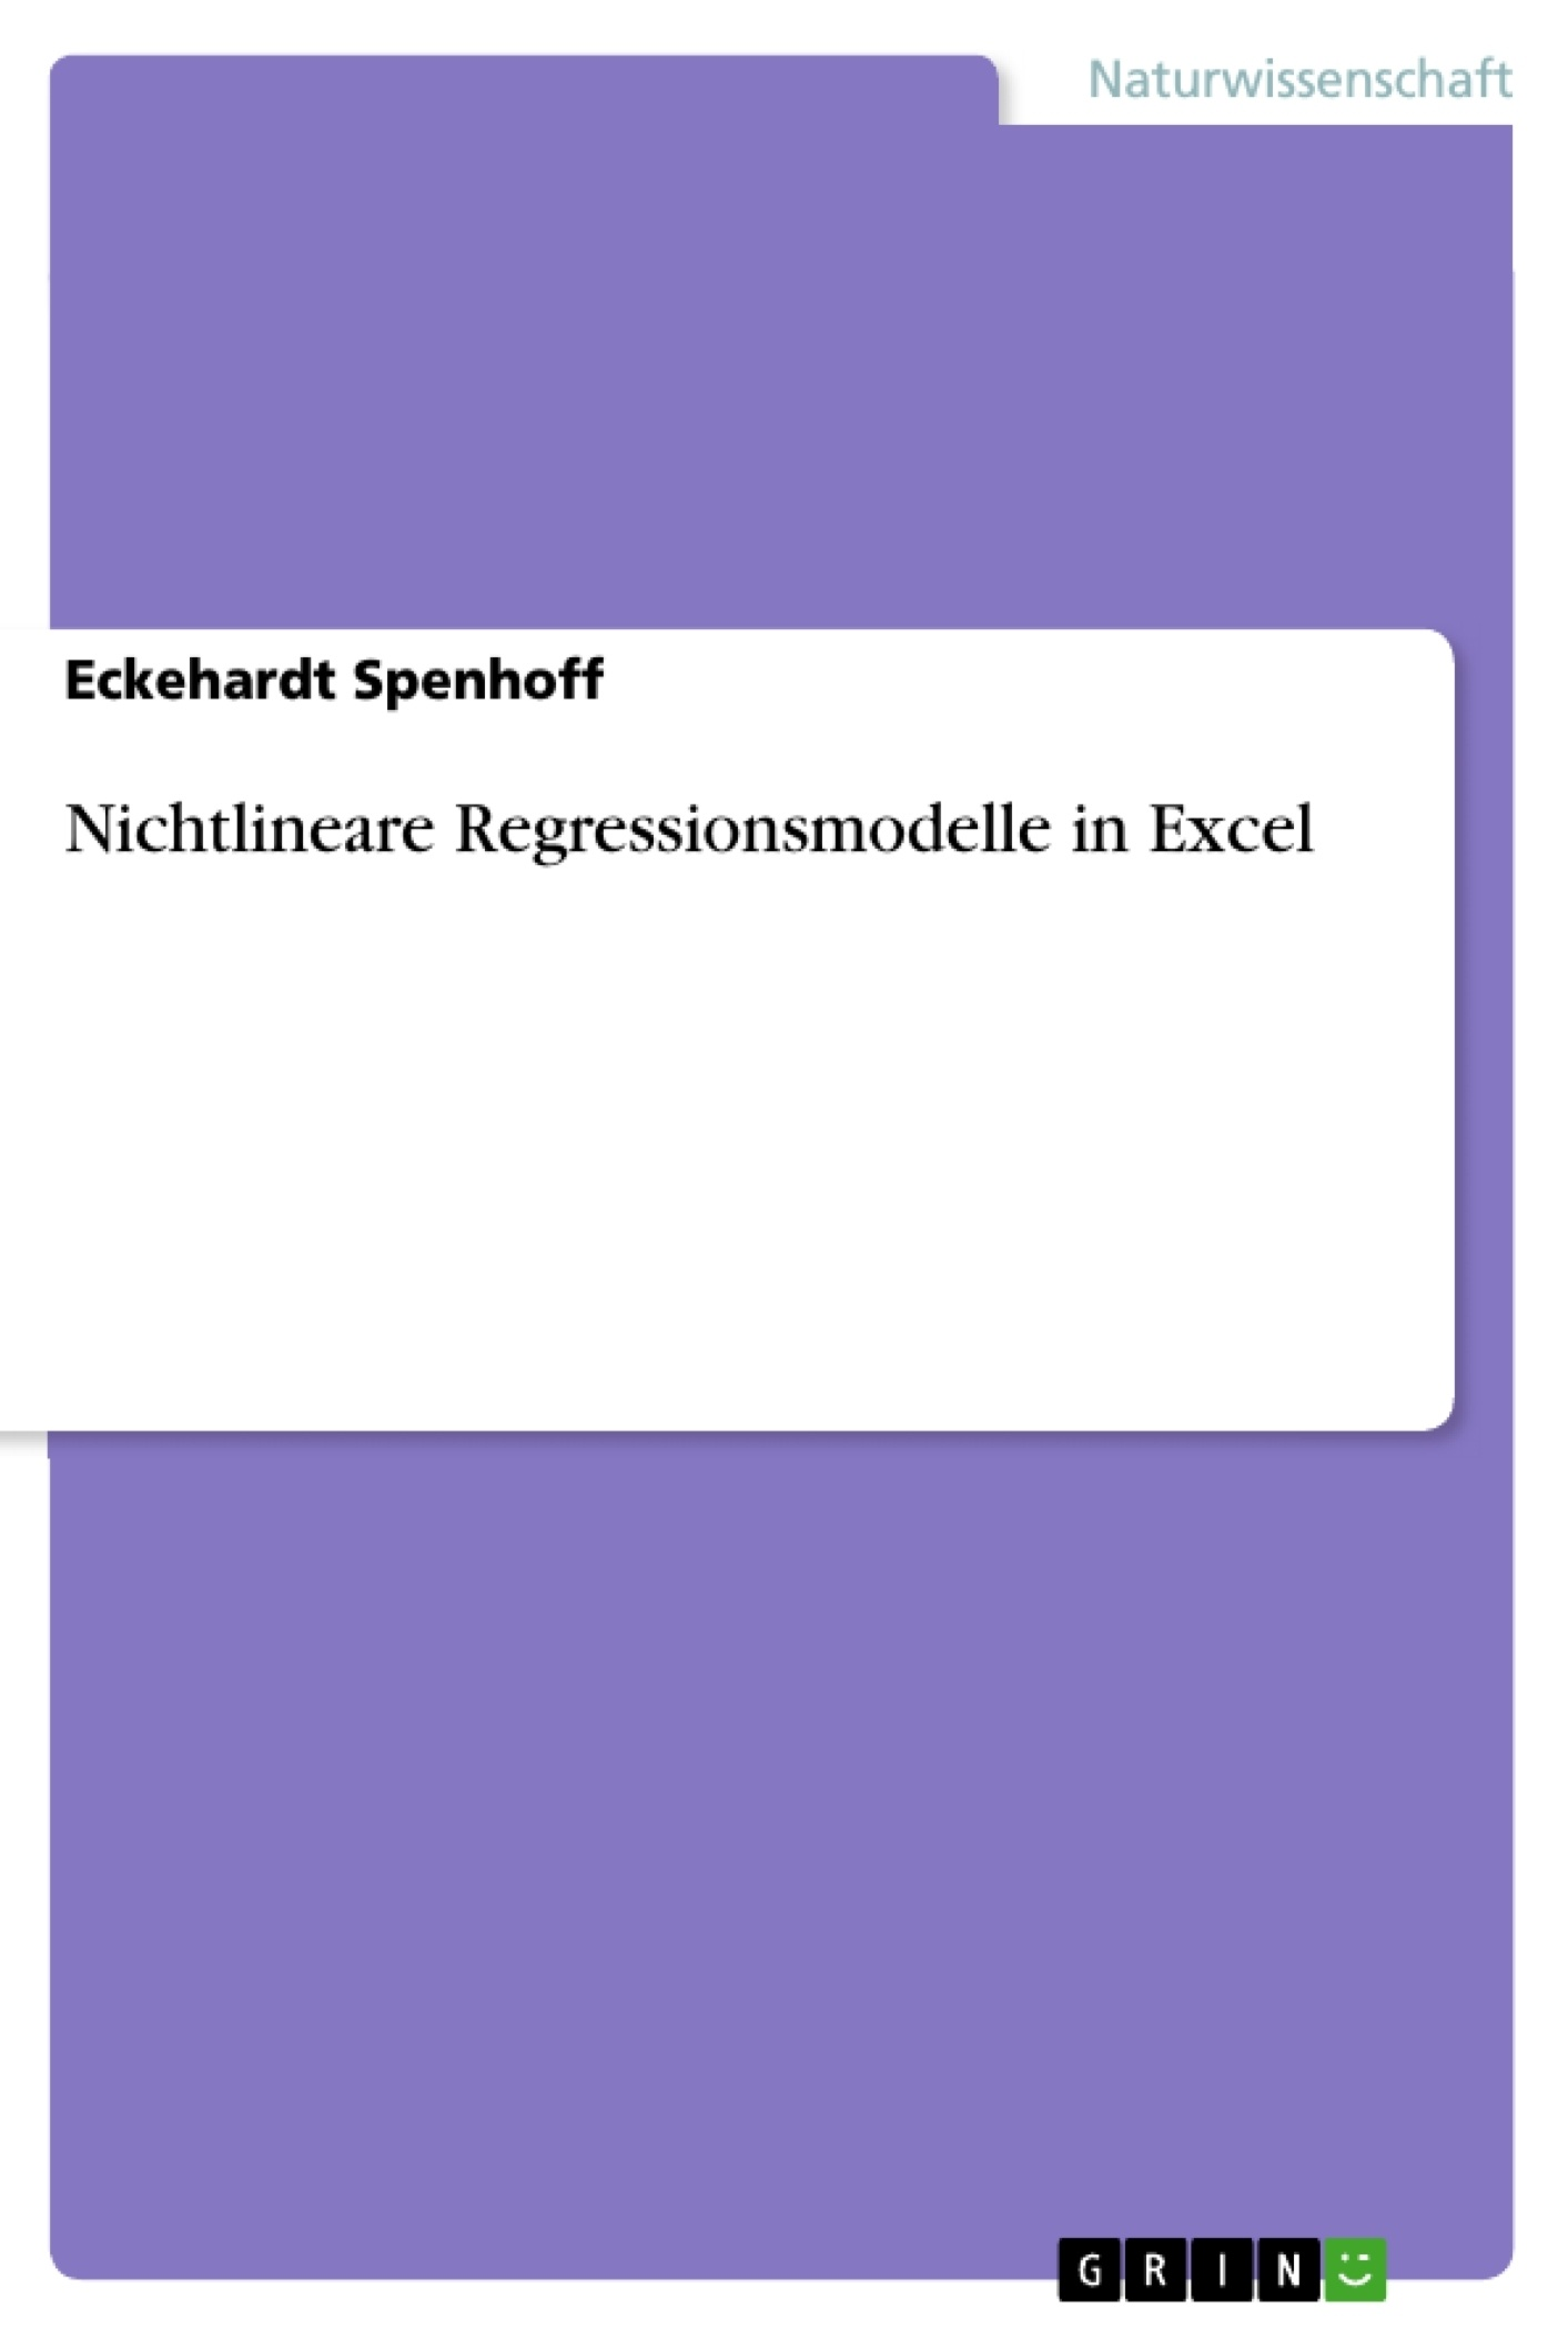 Titel: Nichtlineare Regressionsmodelle in Excel